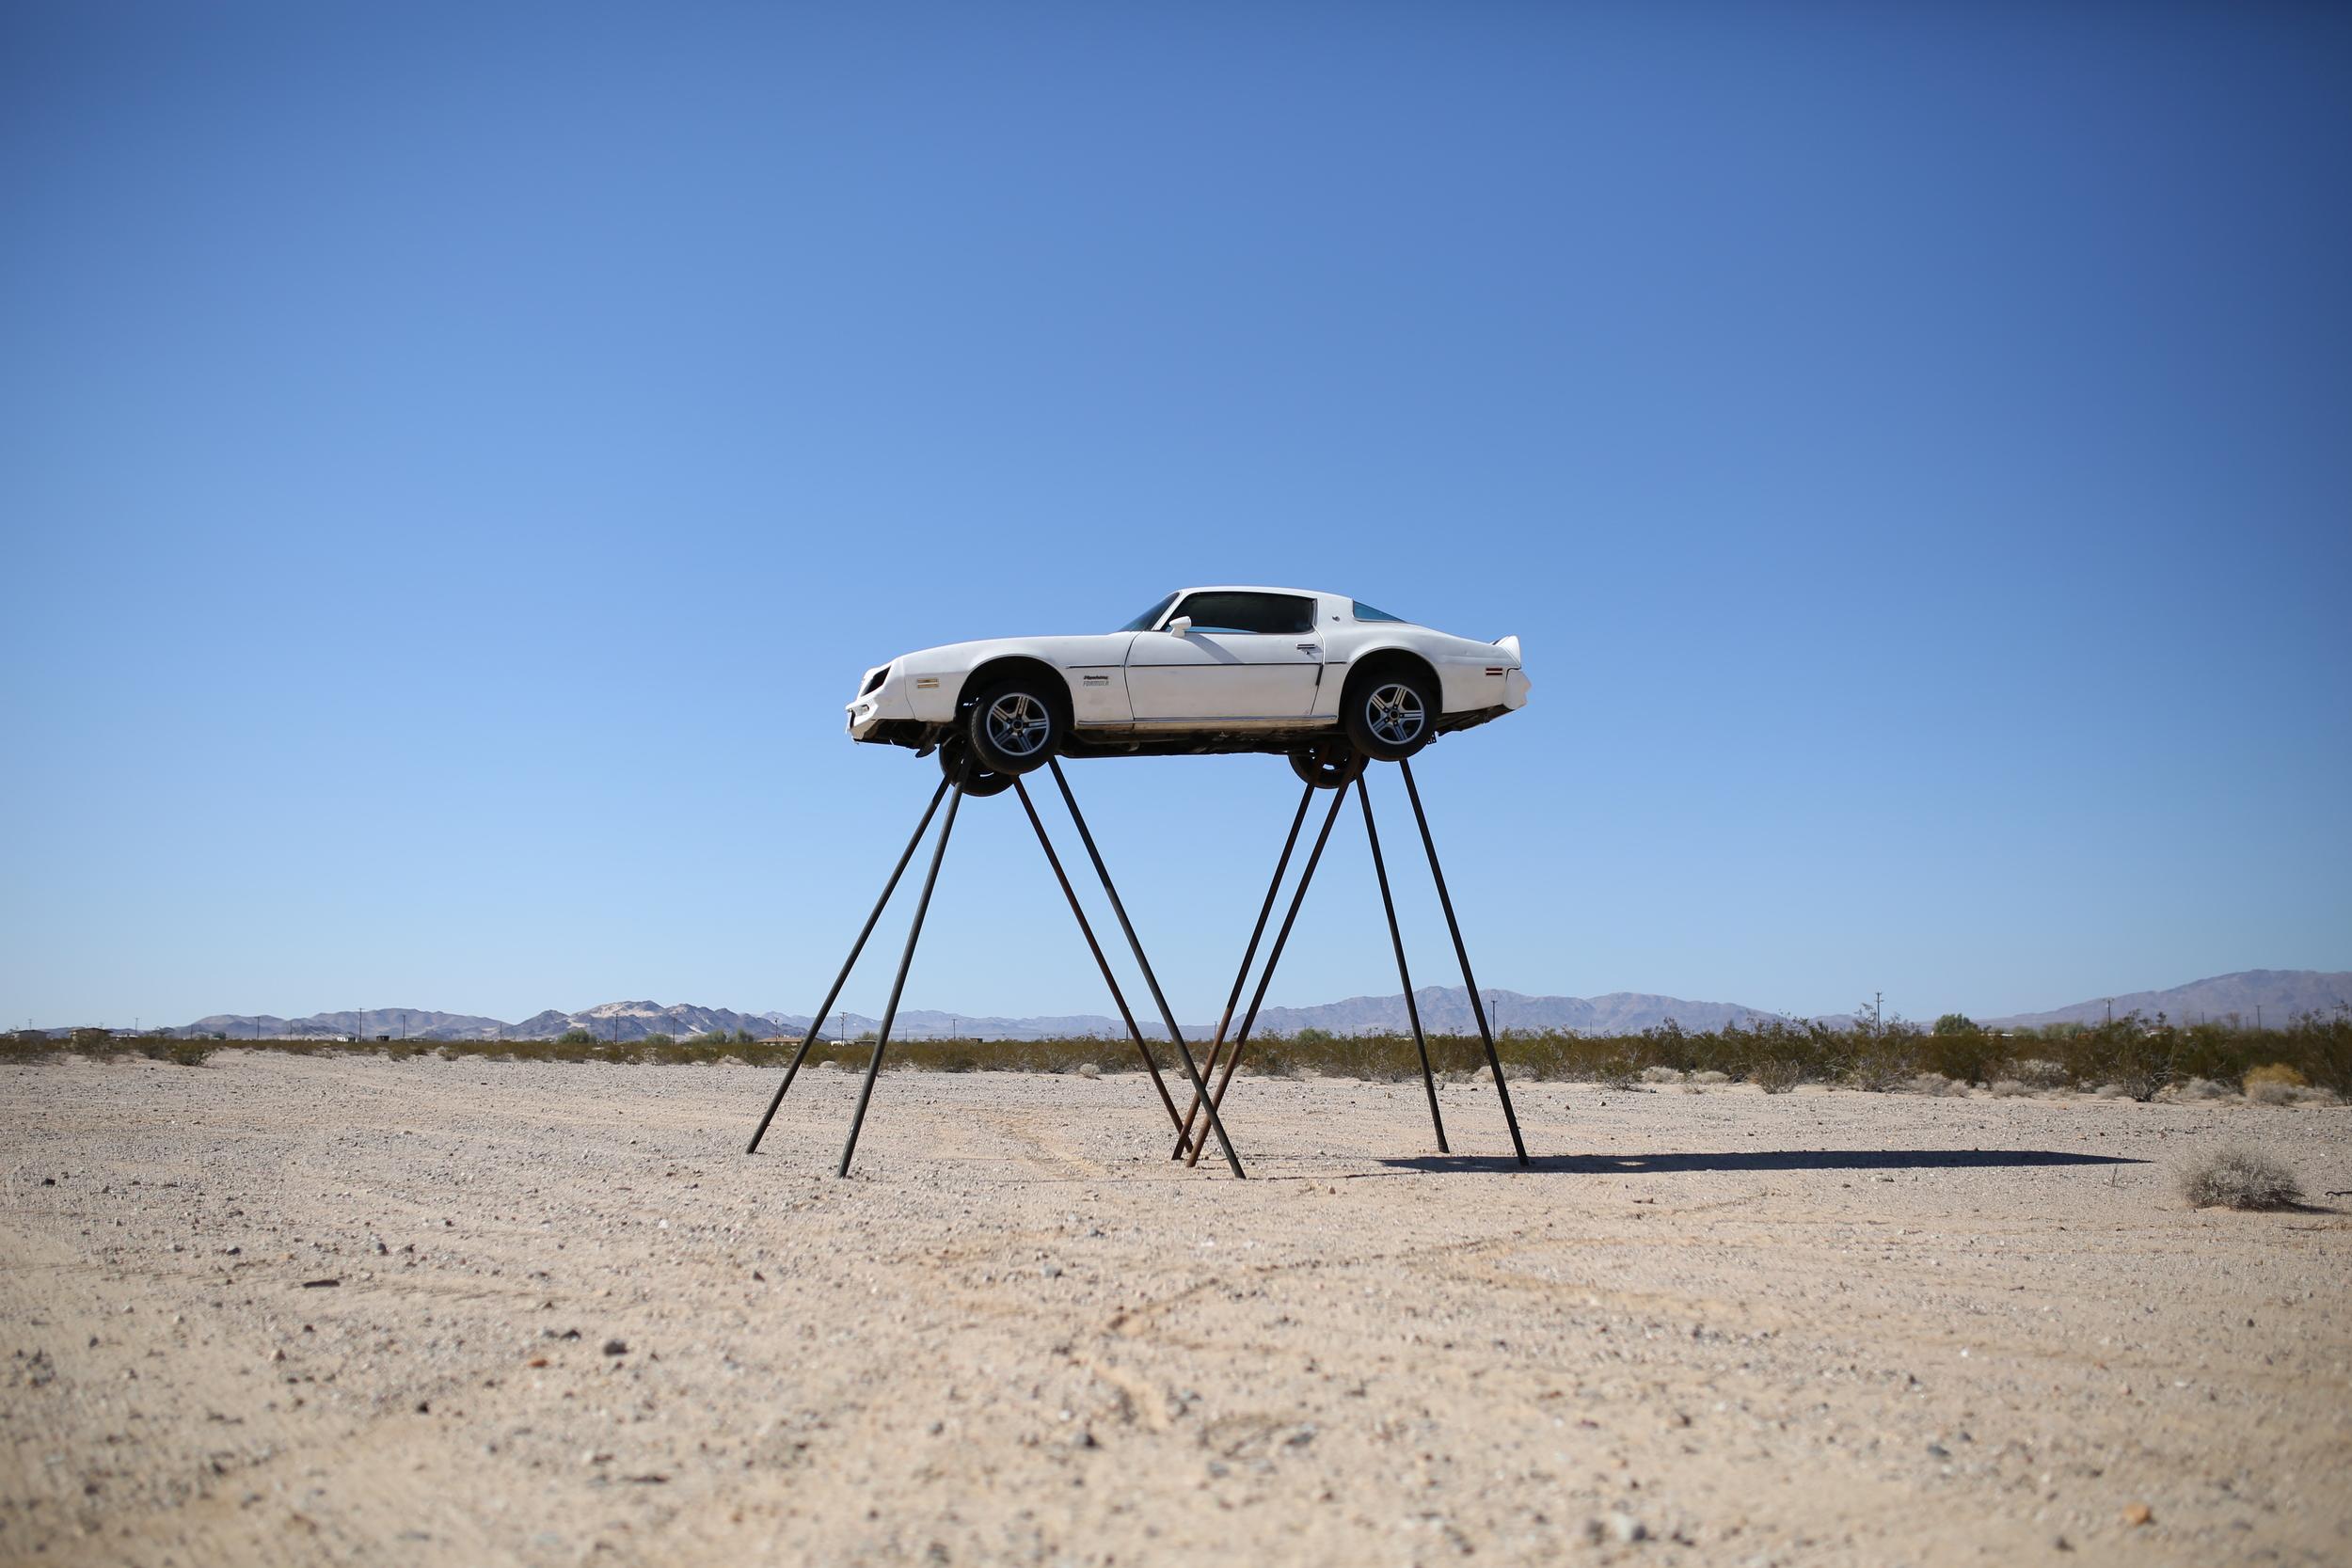 JESSE SUGARMANN    Talks Making Art with Cars